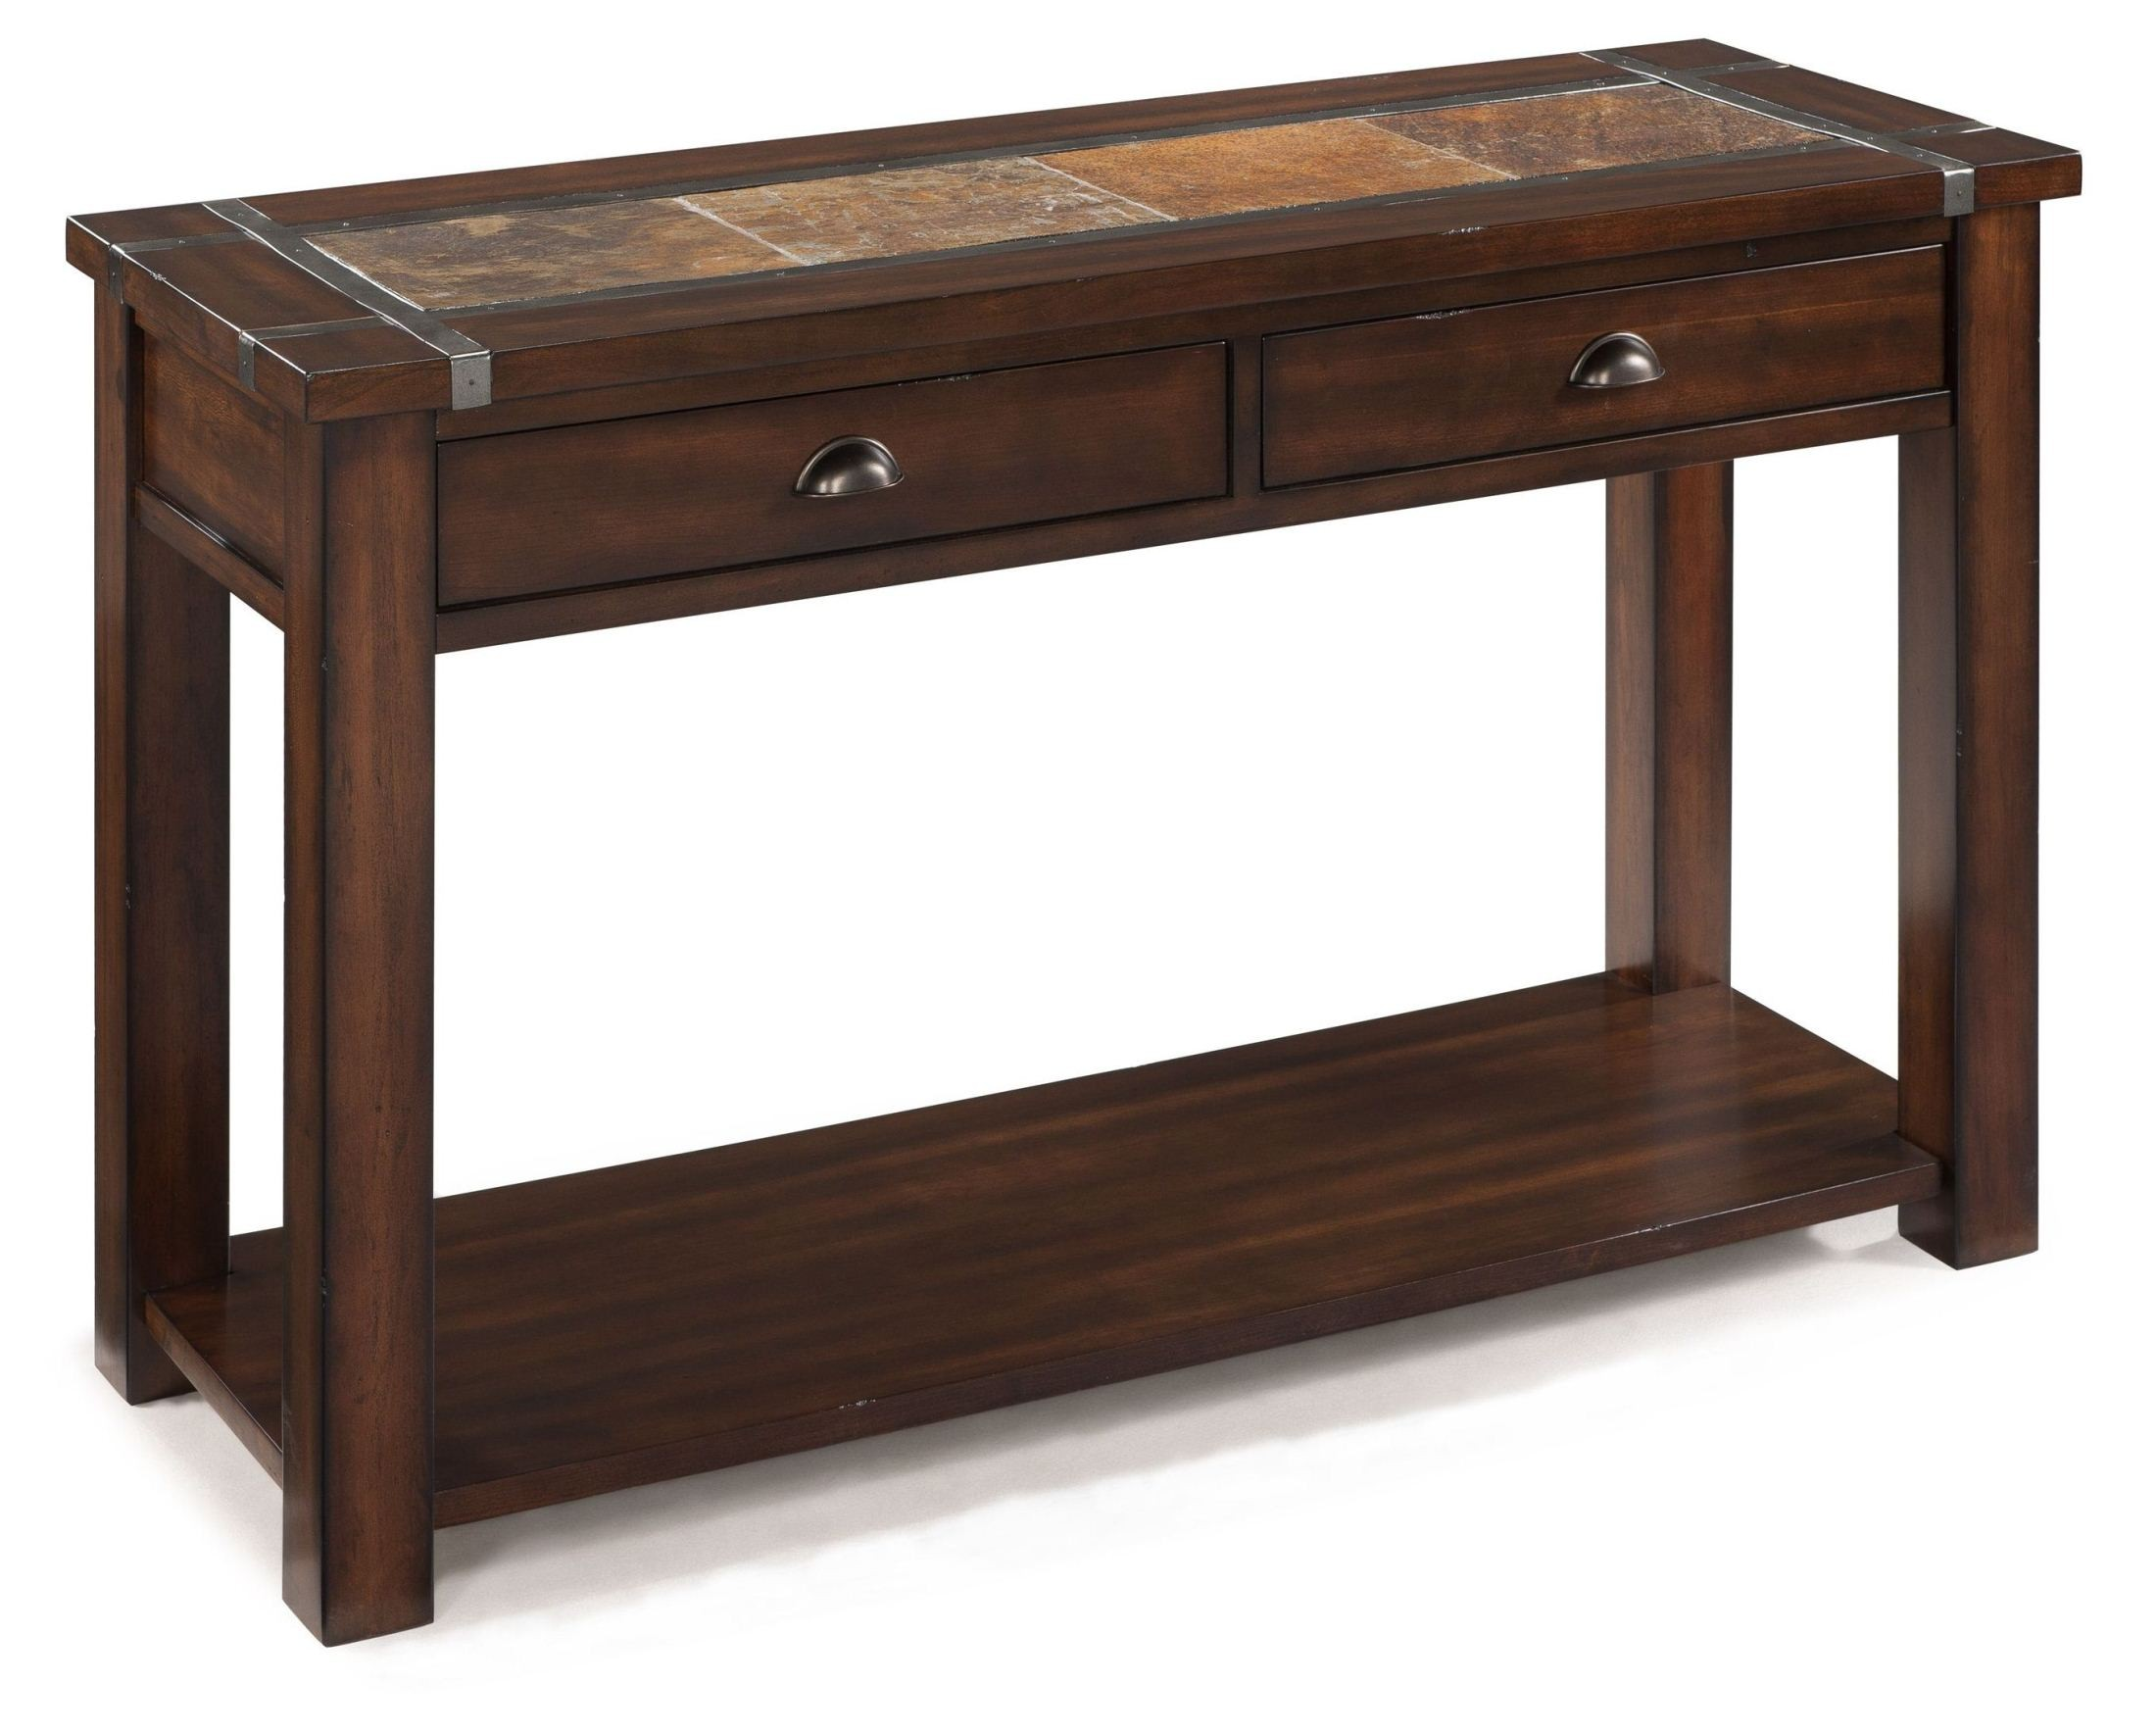 Roanoke rectangular sofa table from magnussen home t2615 for Sofa table tennis